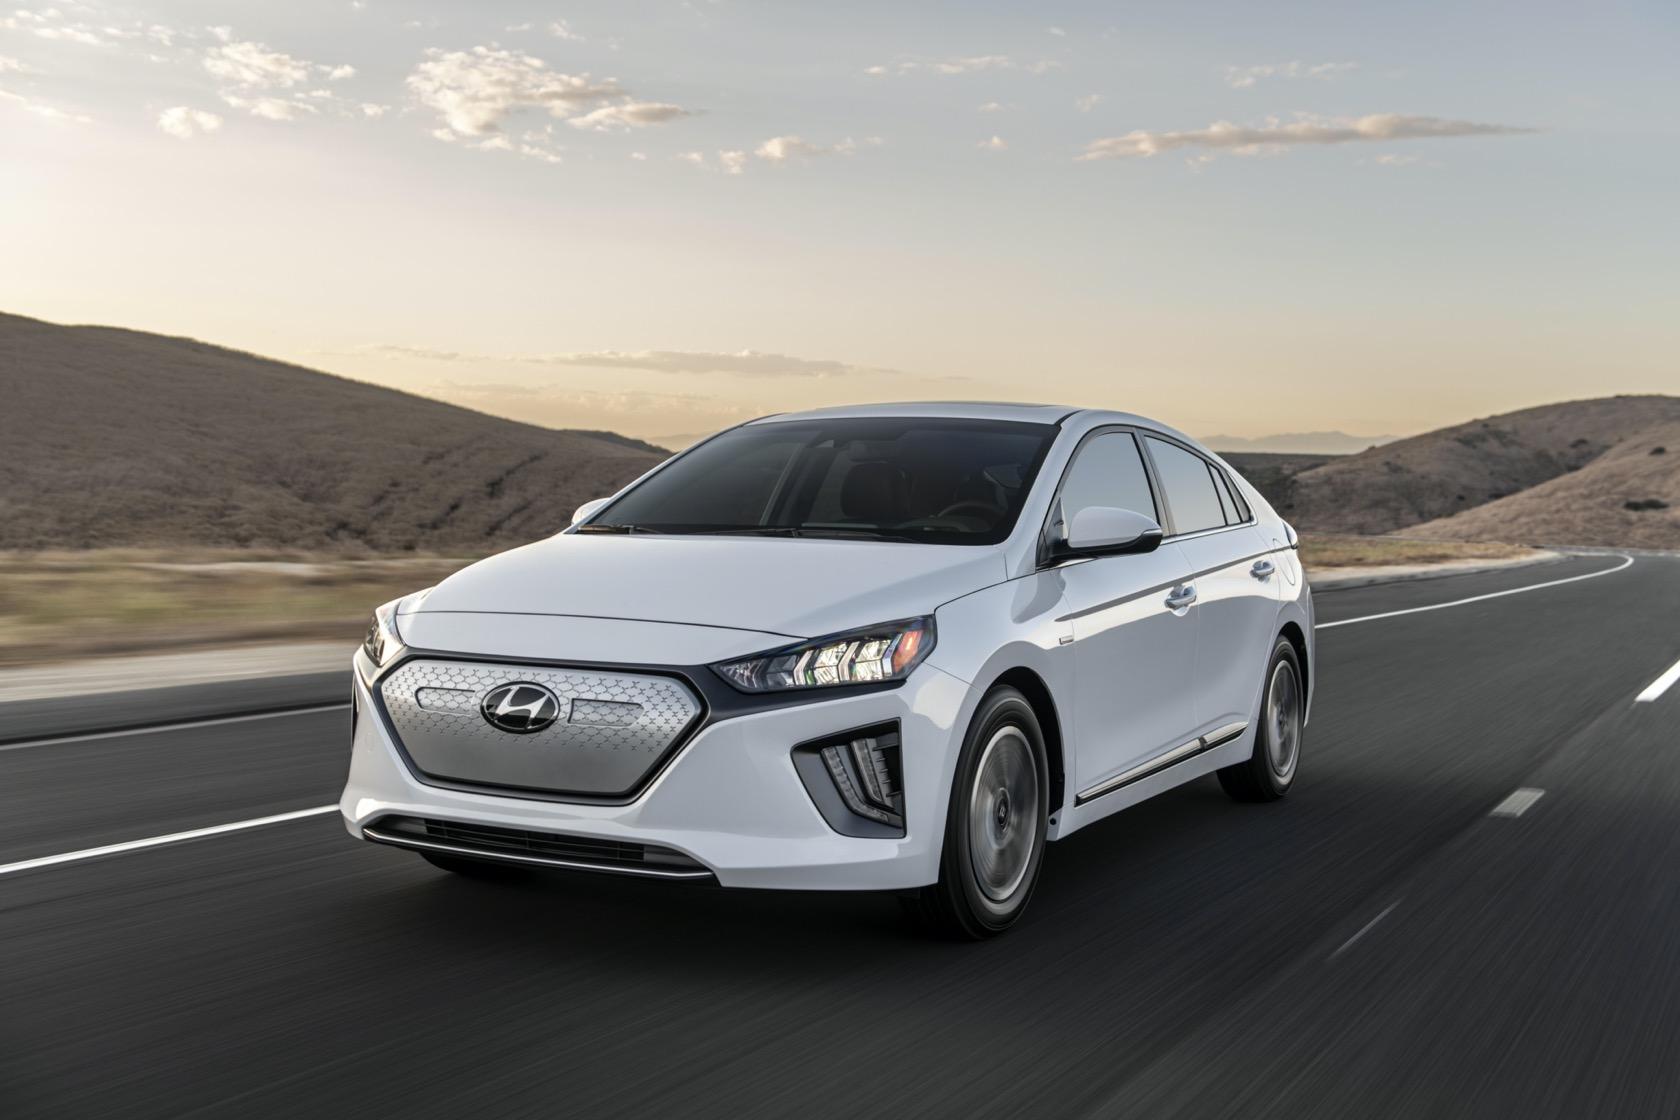 2020 Hyundai Ioniq Electric rises in range, power and price - SlashGear